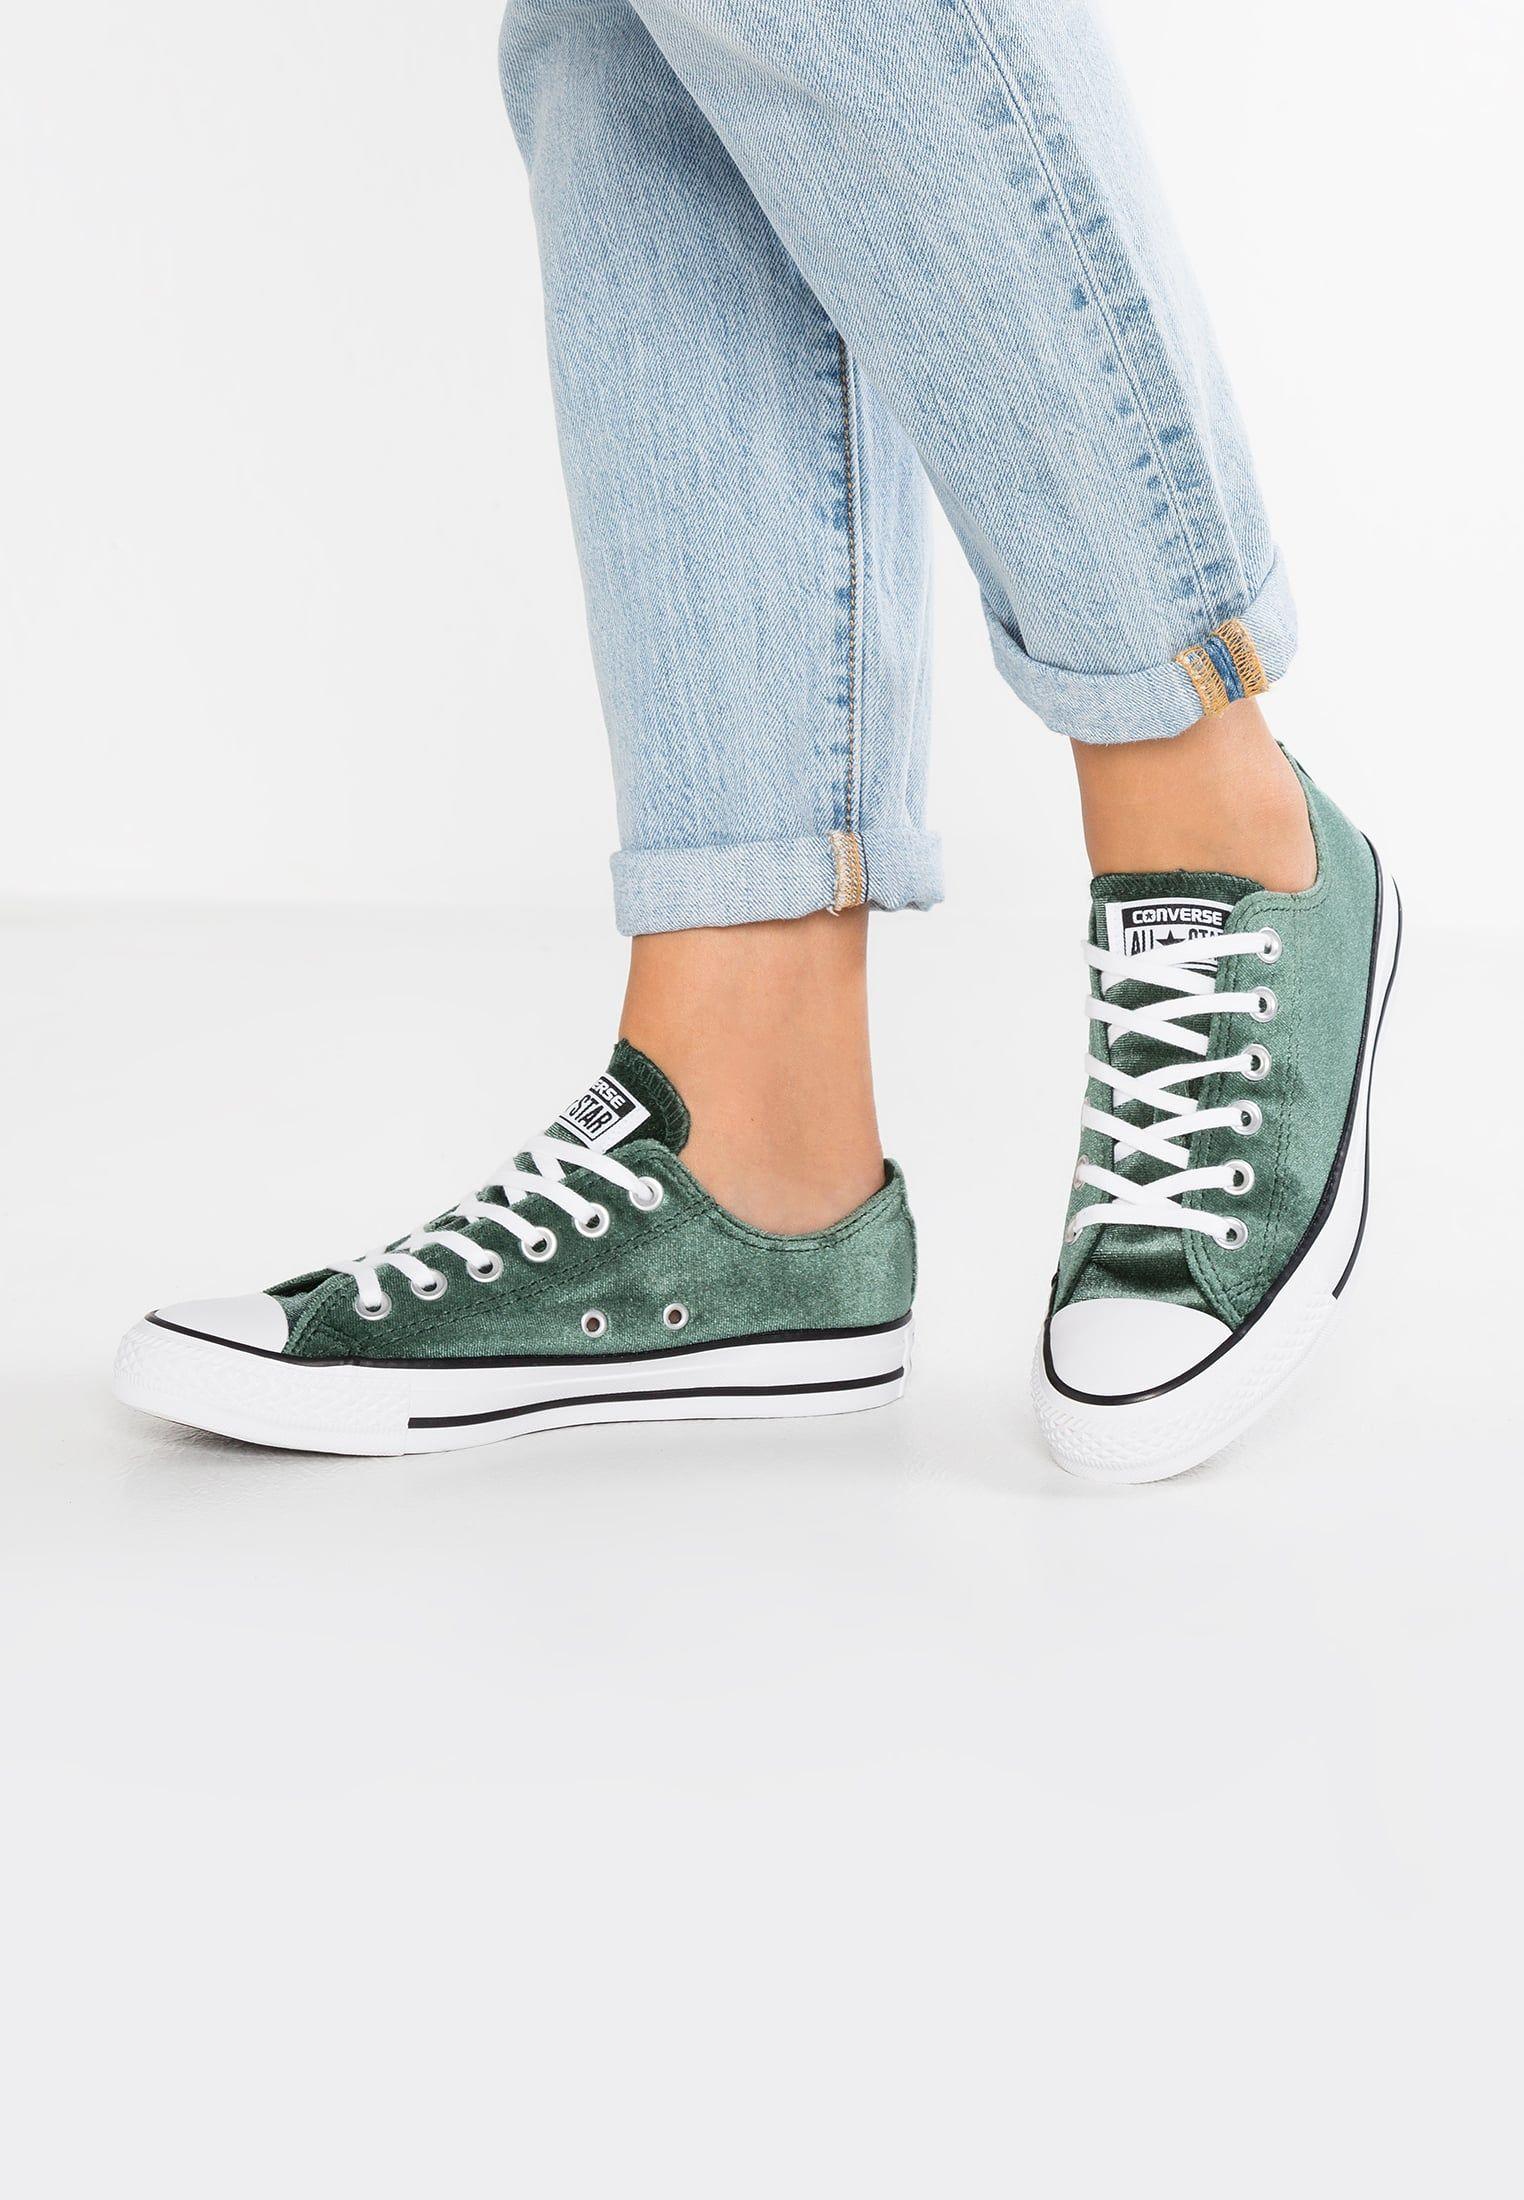 7dfb9d7bae0 Converse CHUCK TAYLOR ALL STAR VELVET - Sneakers laag - deep emerald/white  - Zalando.nl